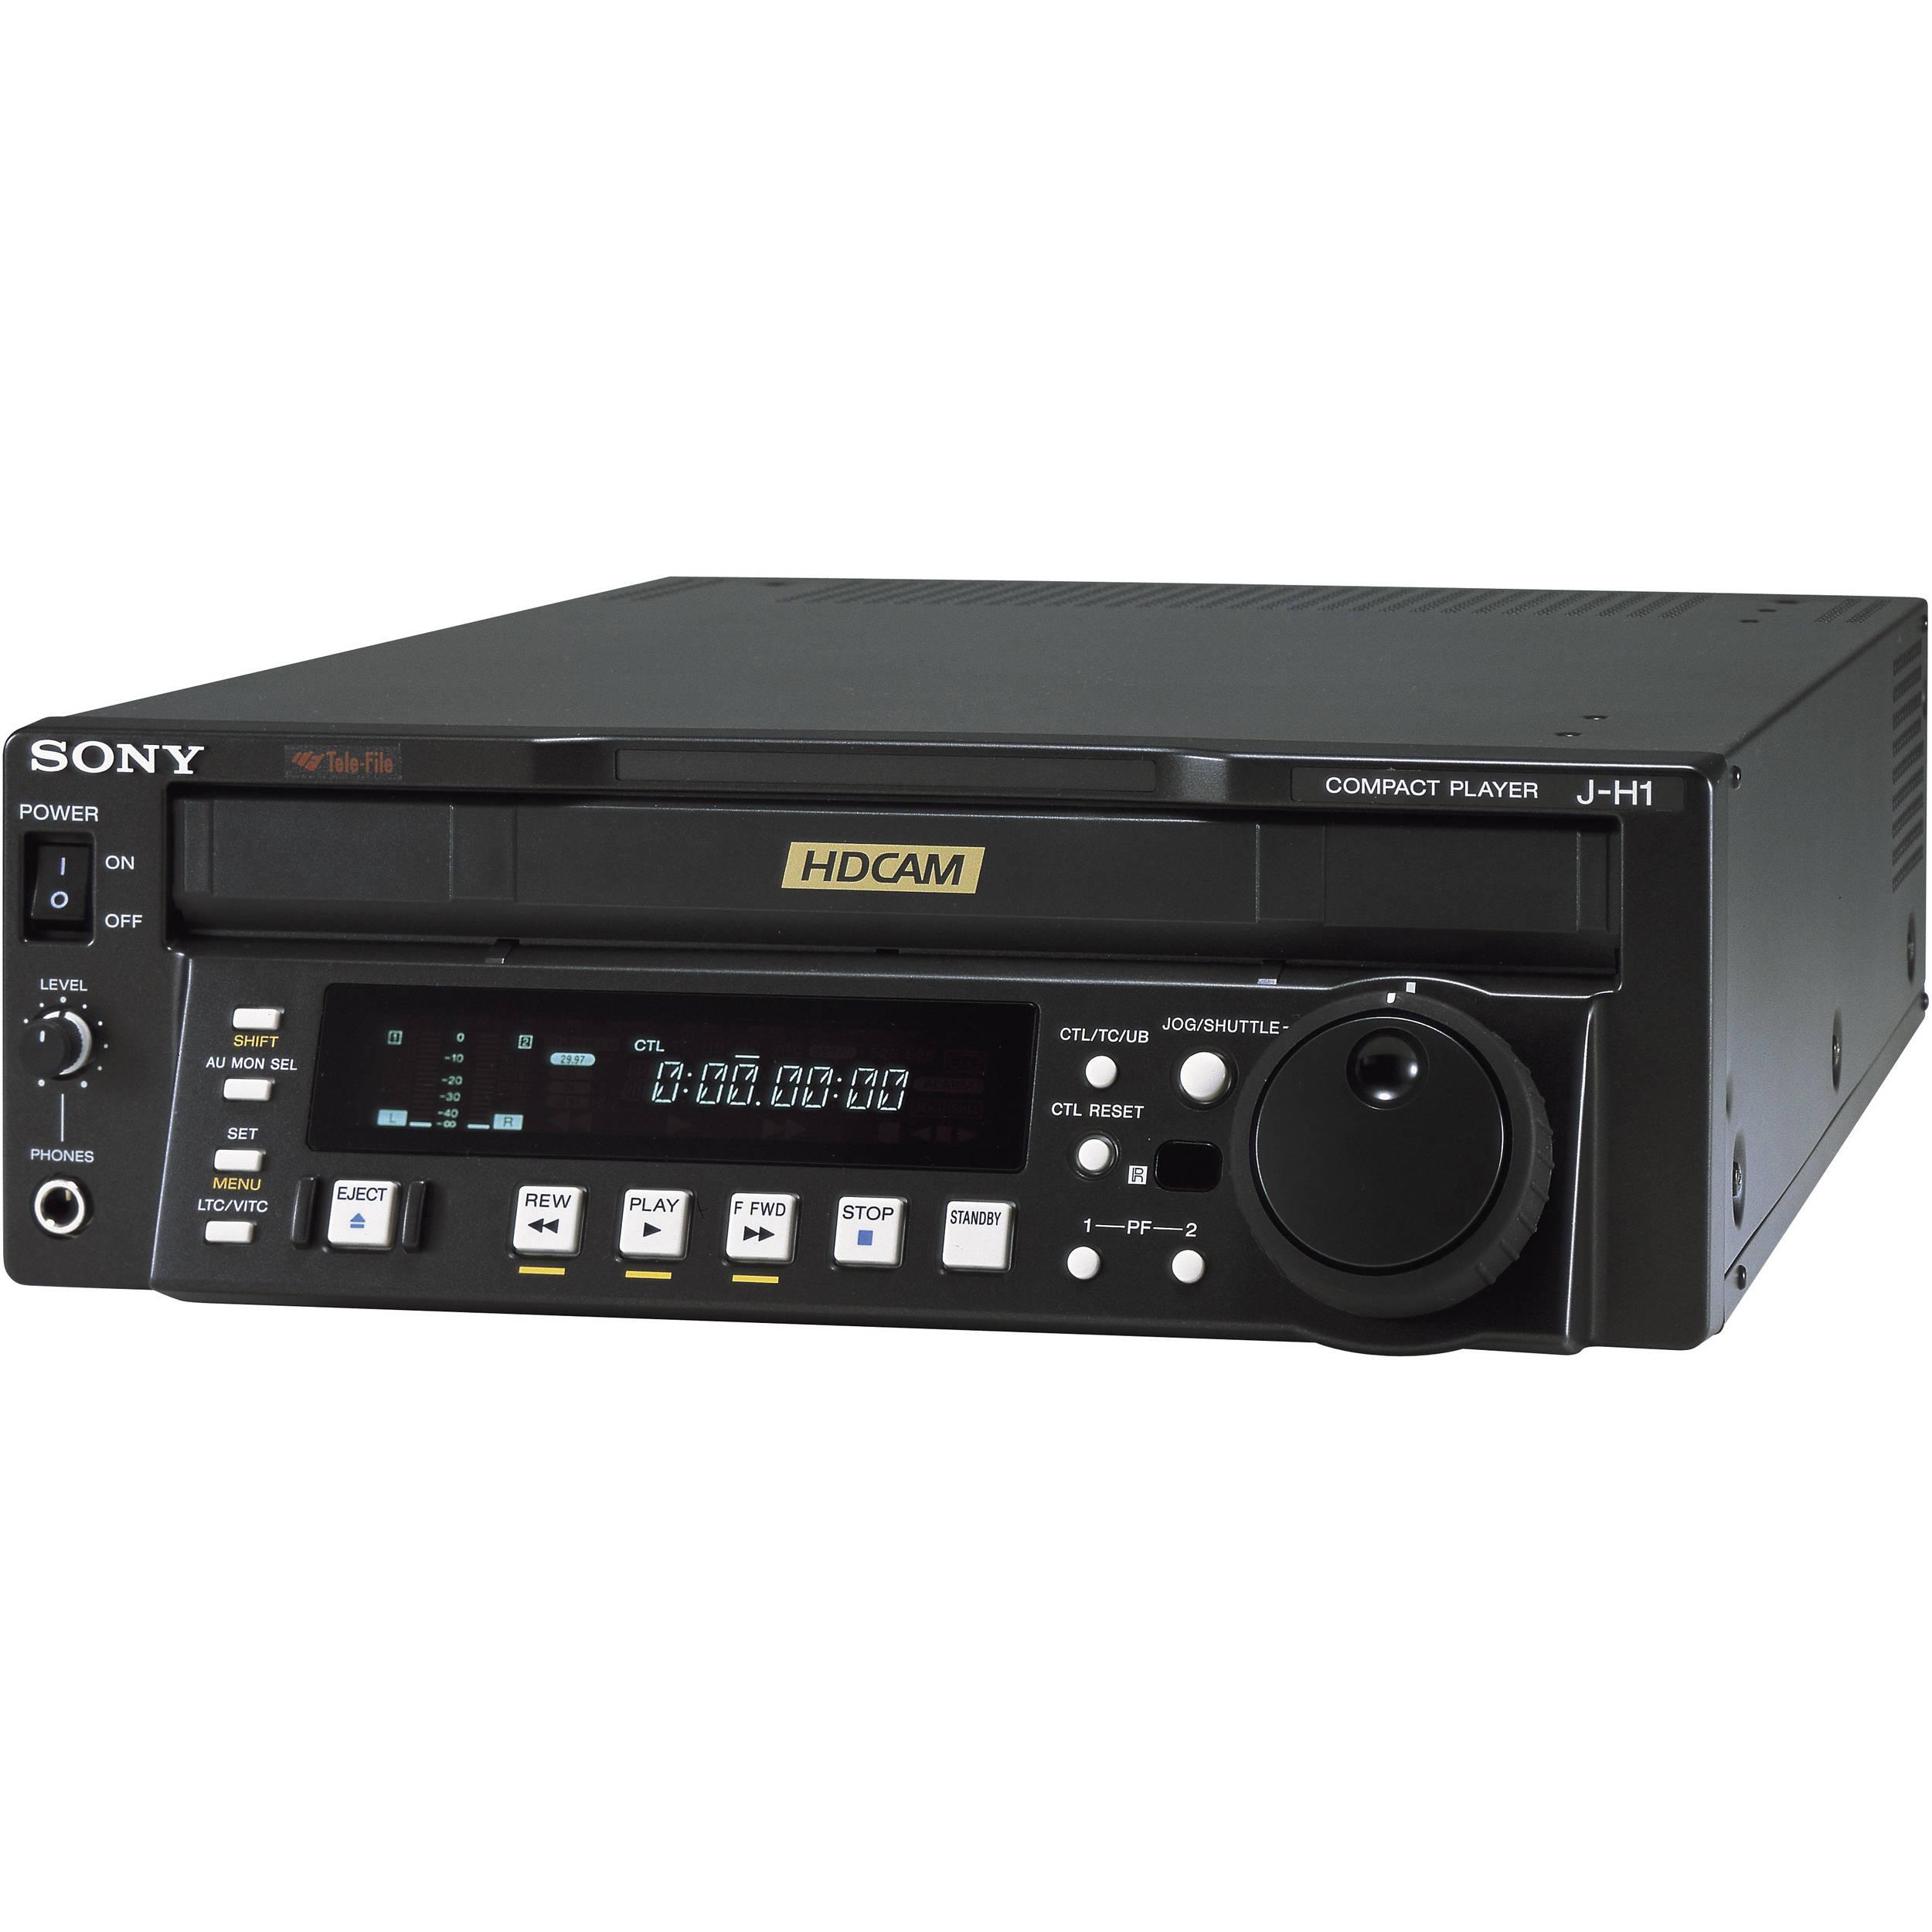 sony jh 1 hdcam digital video cassette player jh1 b h photo rh bhphotovideo com DPX300U Manual Sony M 80 Manual